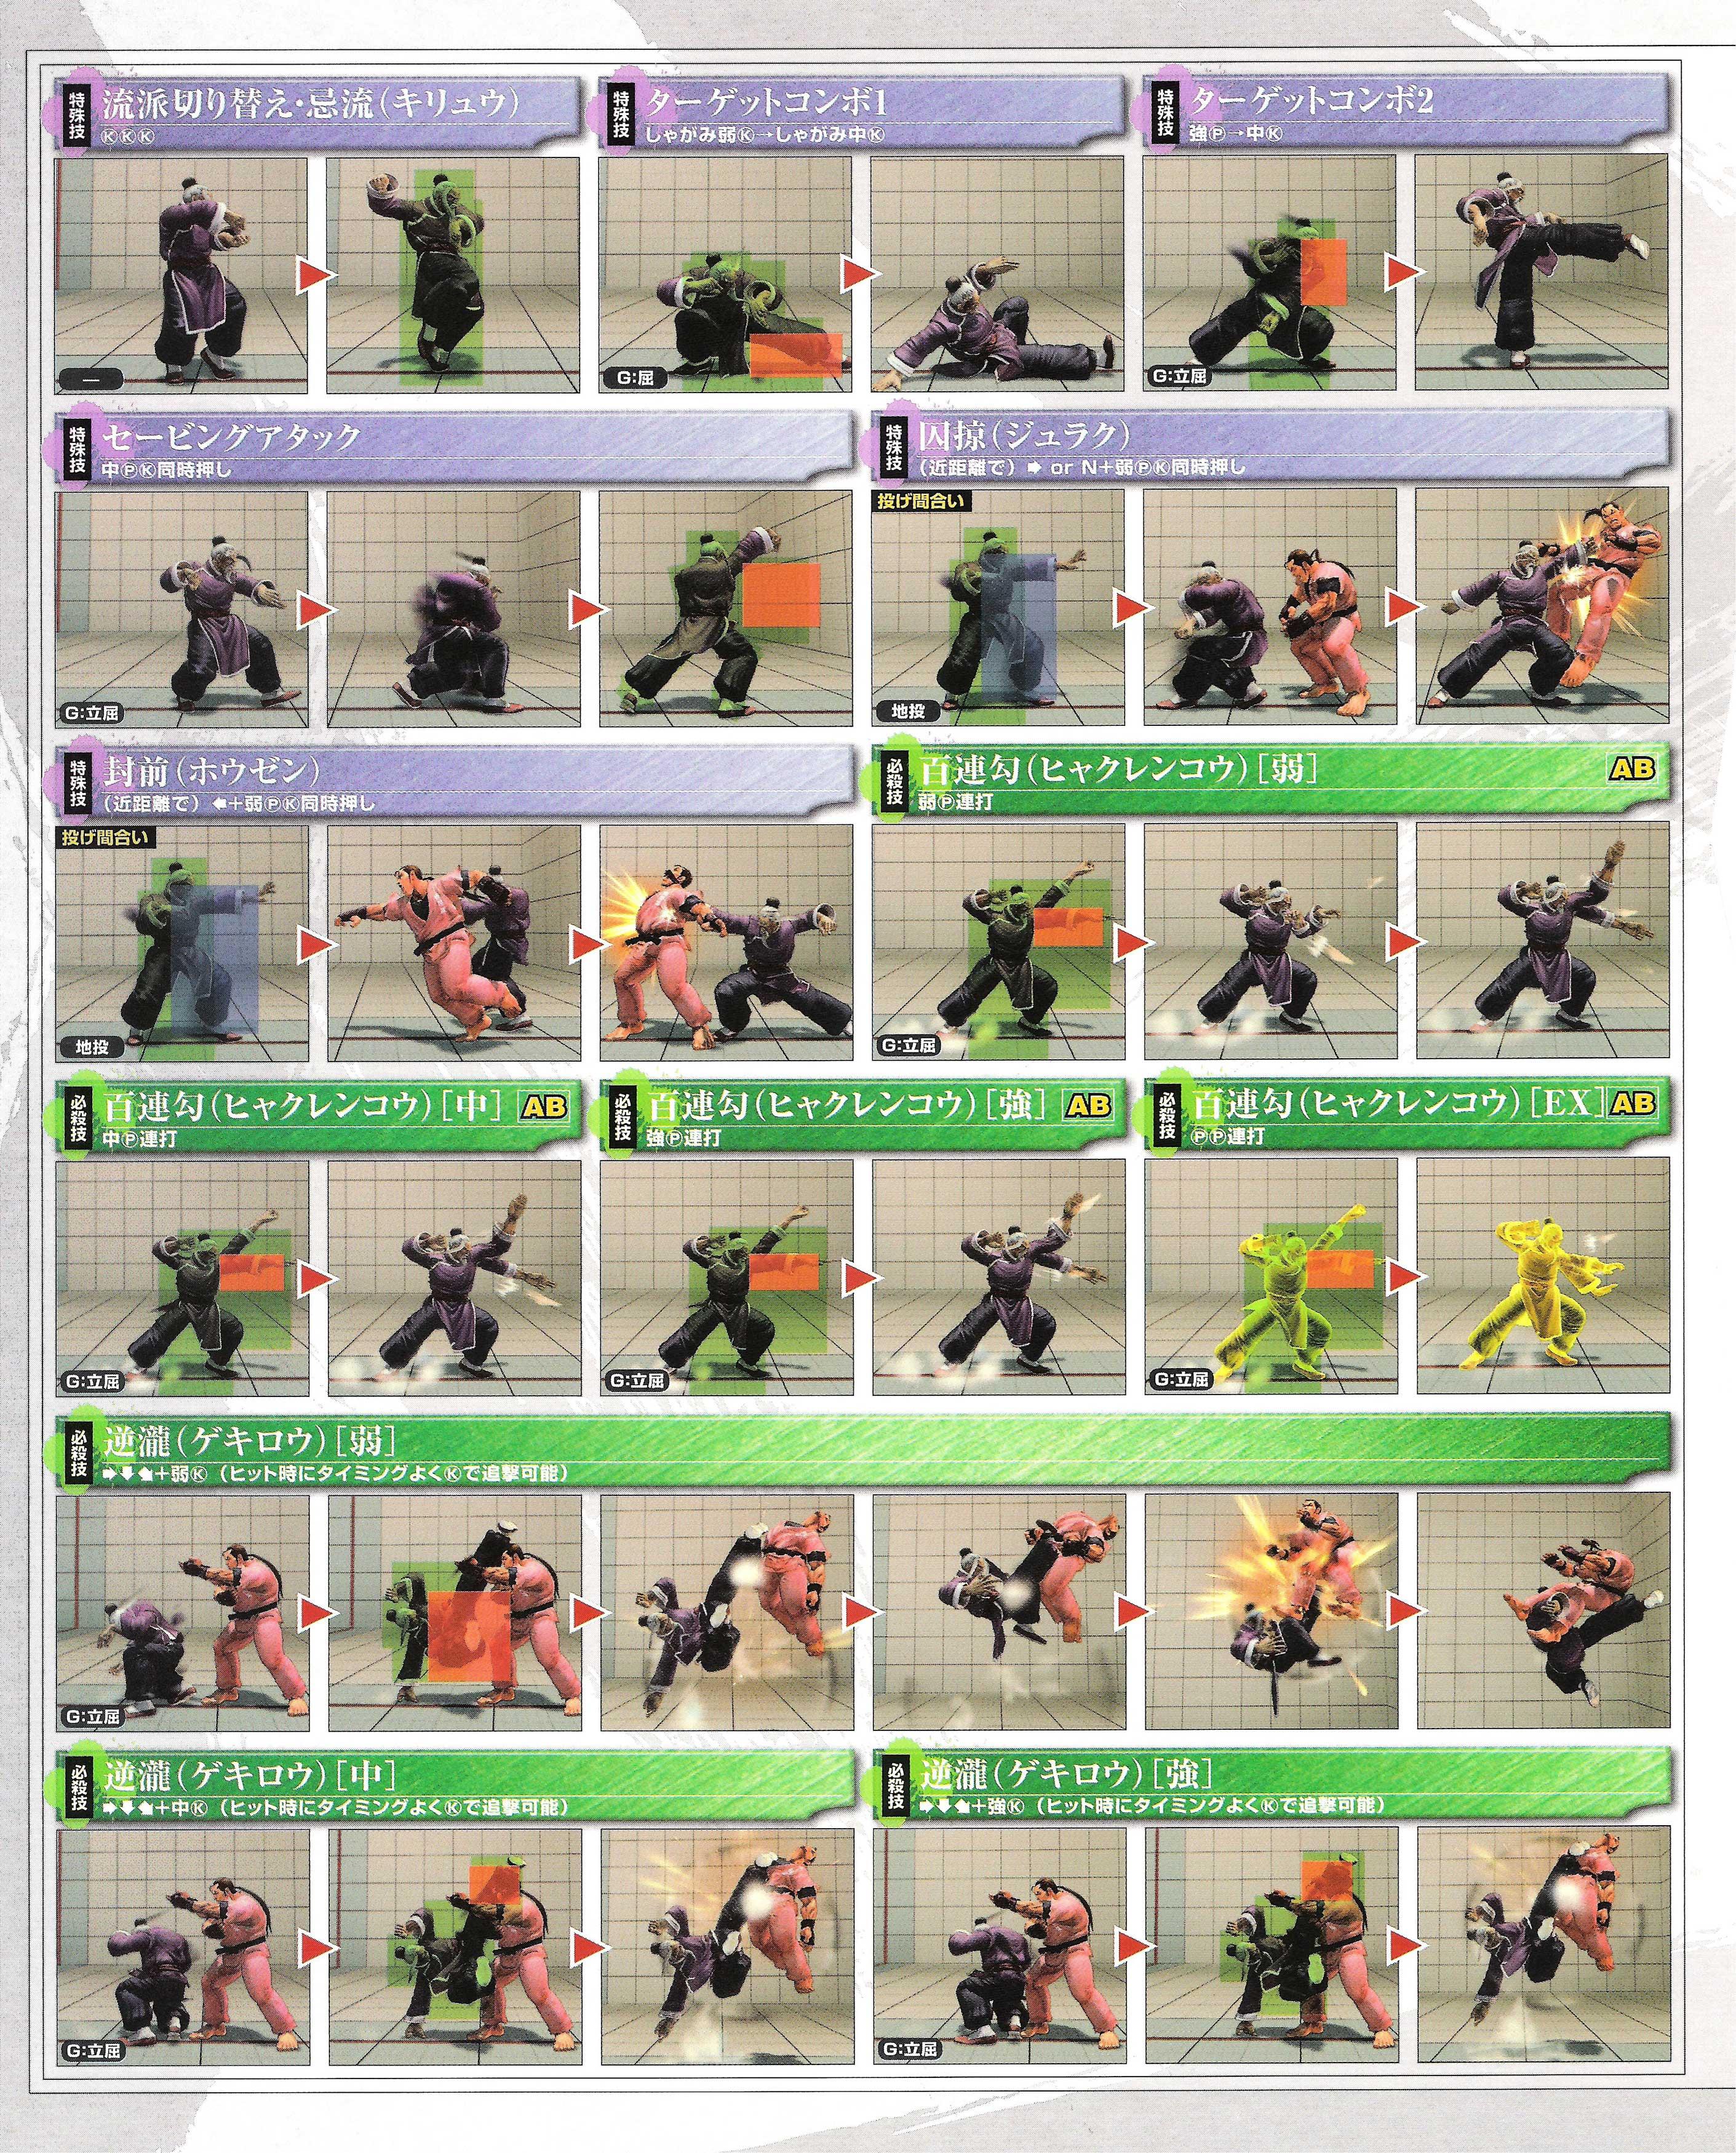 Gen's hit box information for Super Street Fighter 4 Arcade Edition image #5